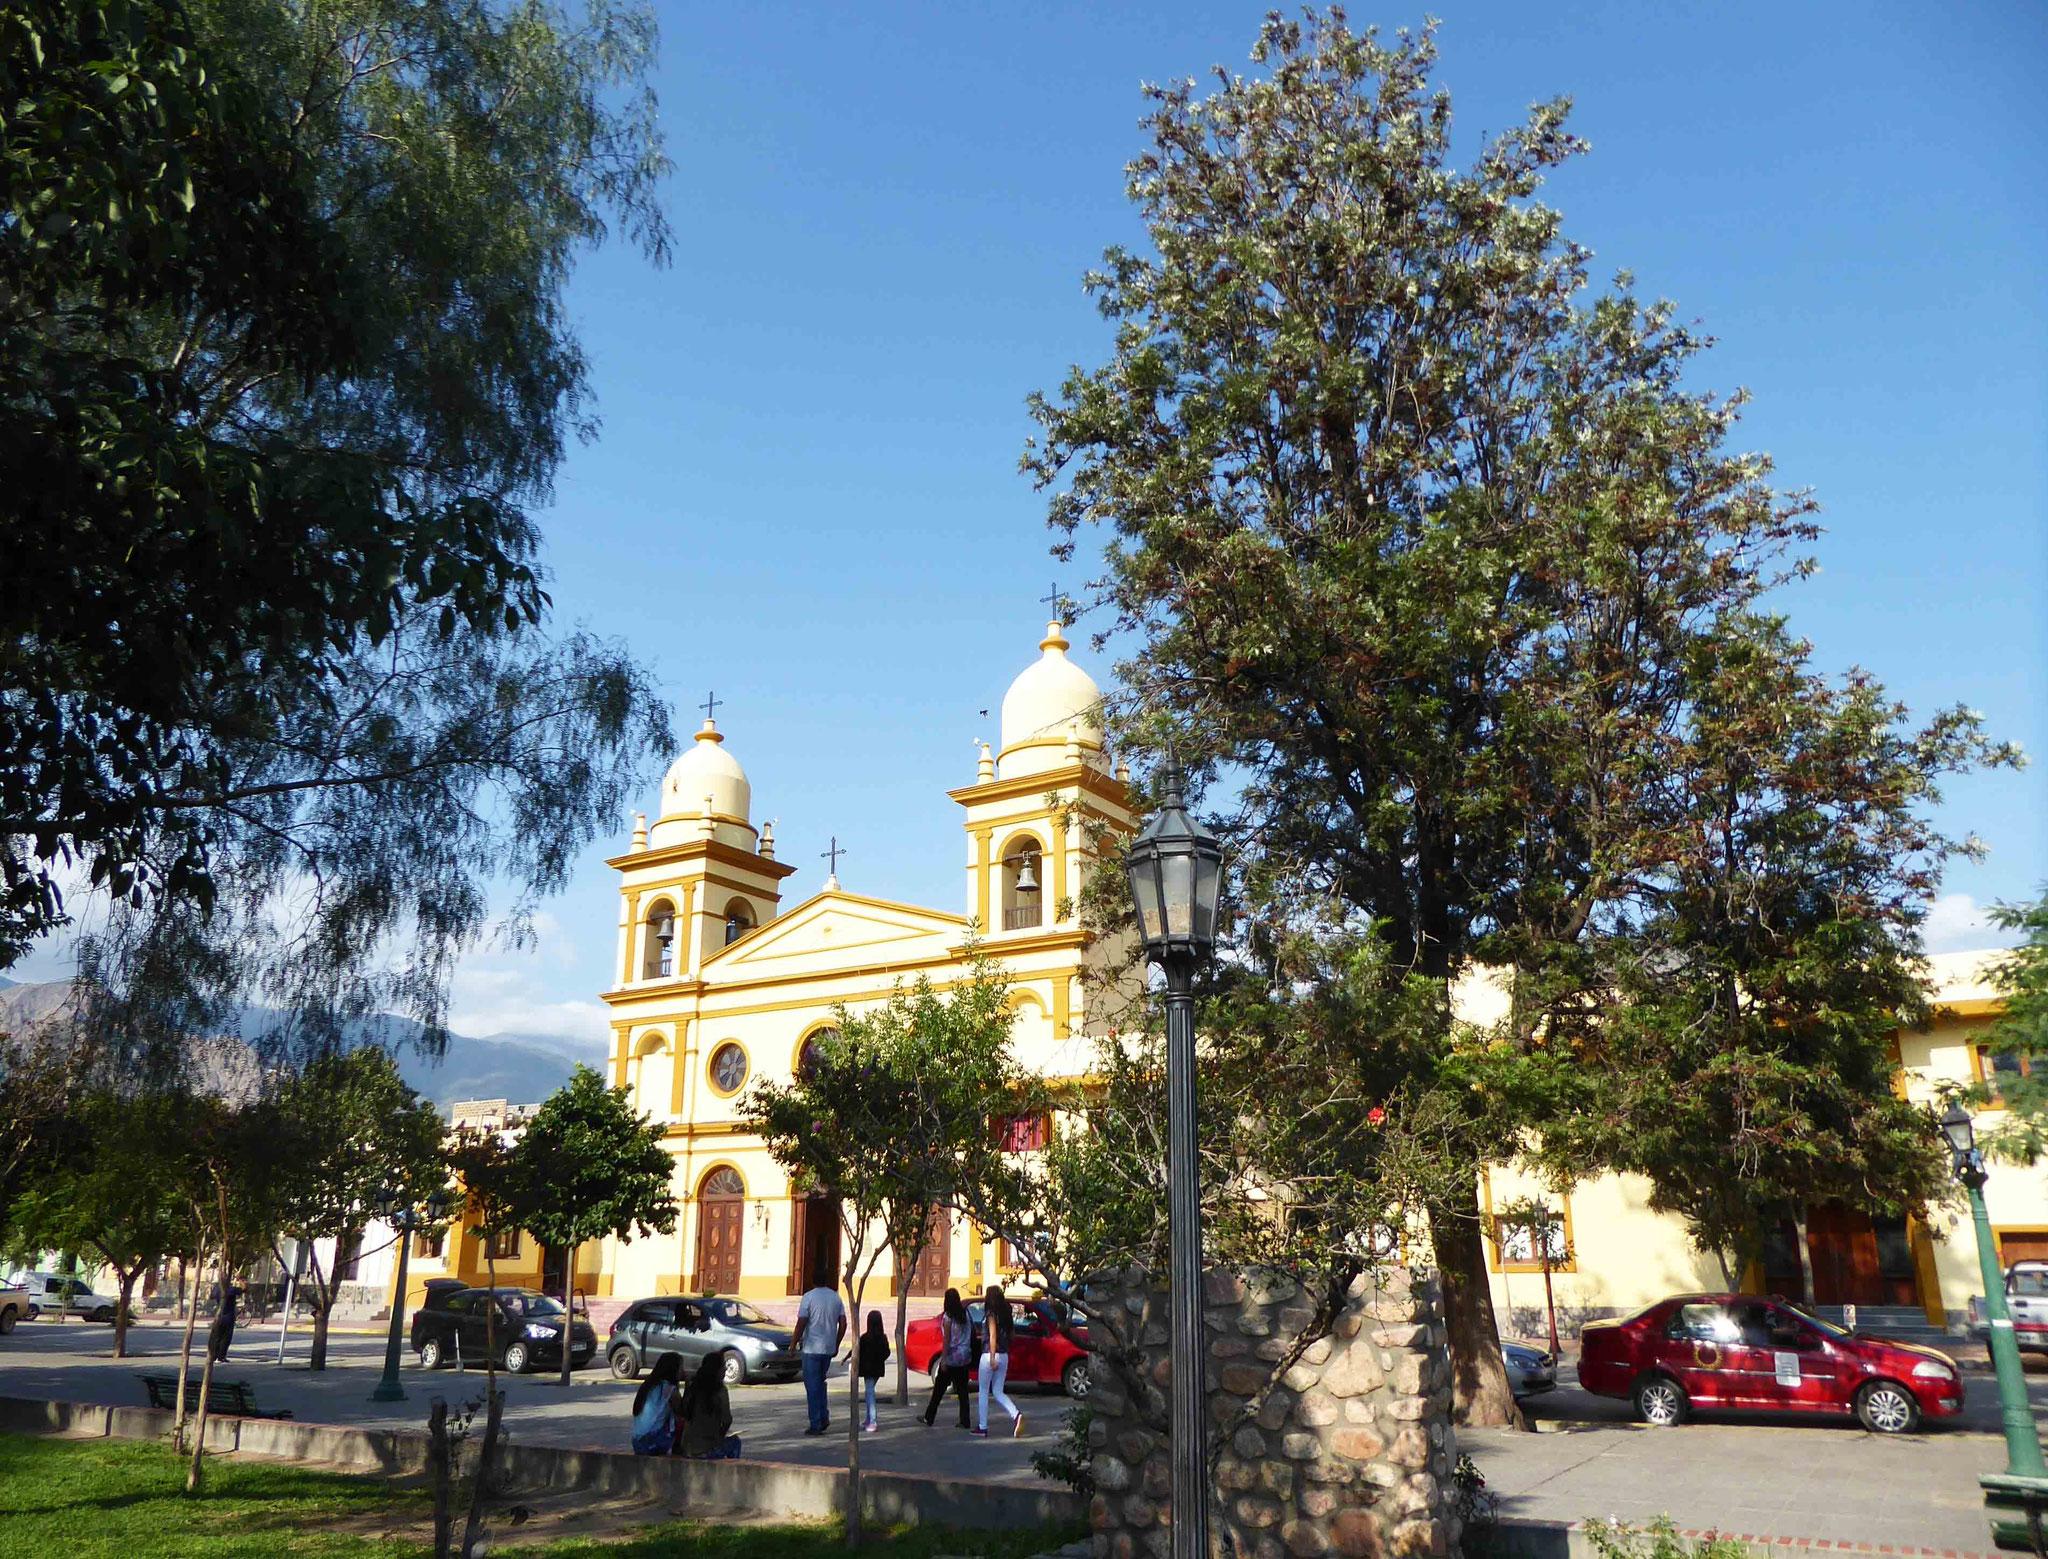 La cathédrale de Cafayate